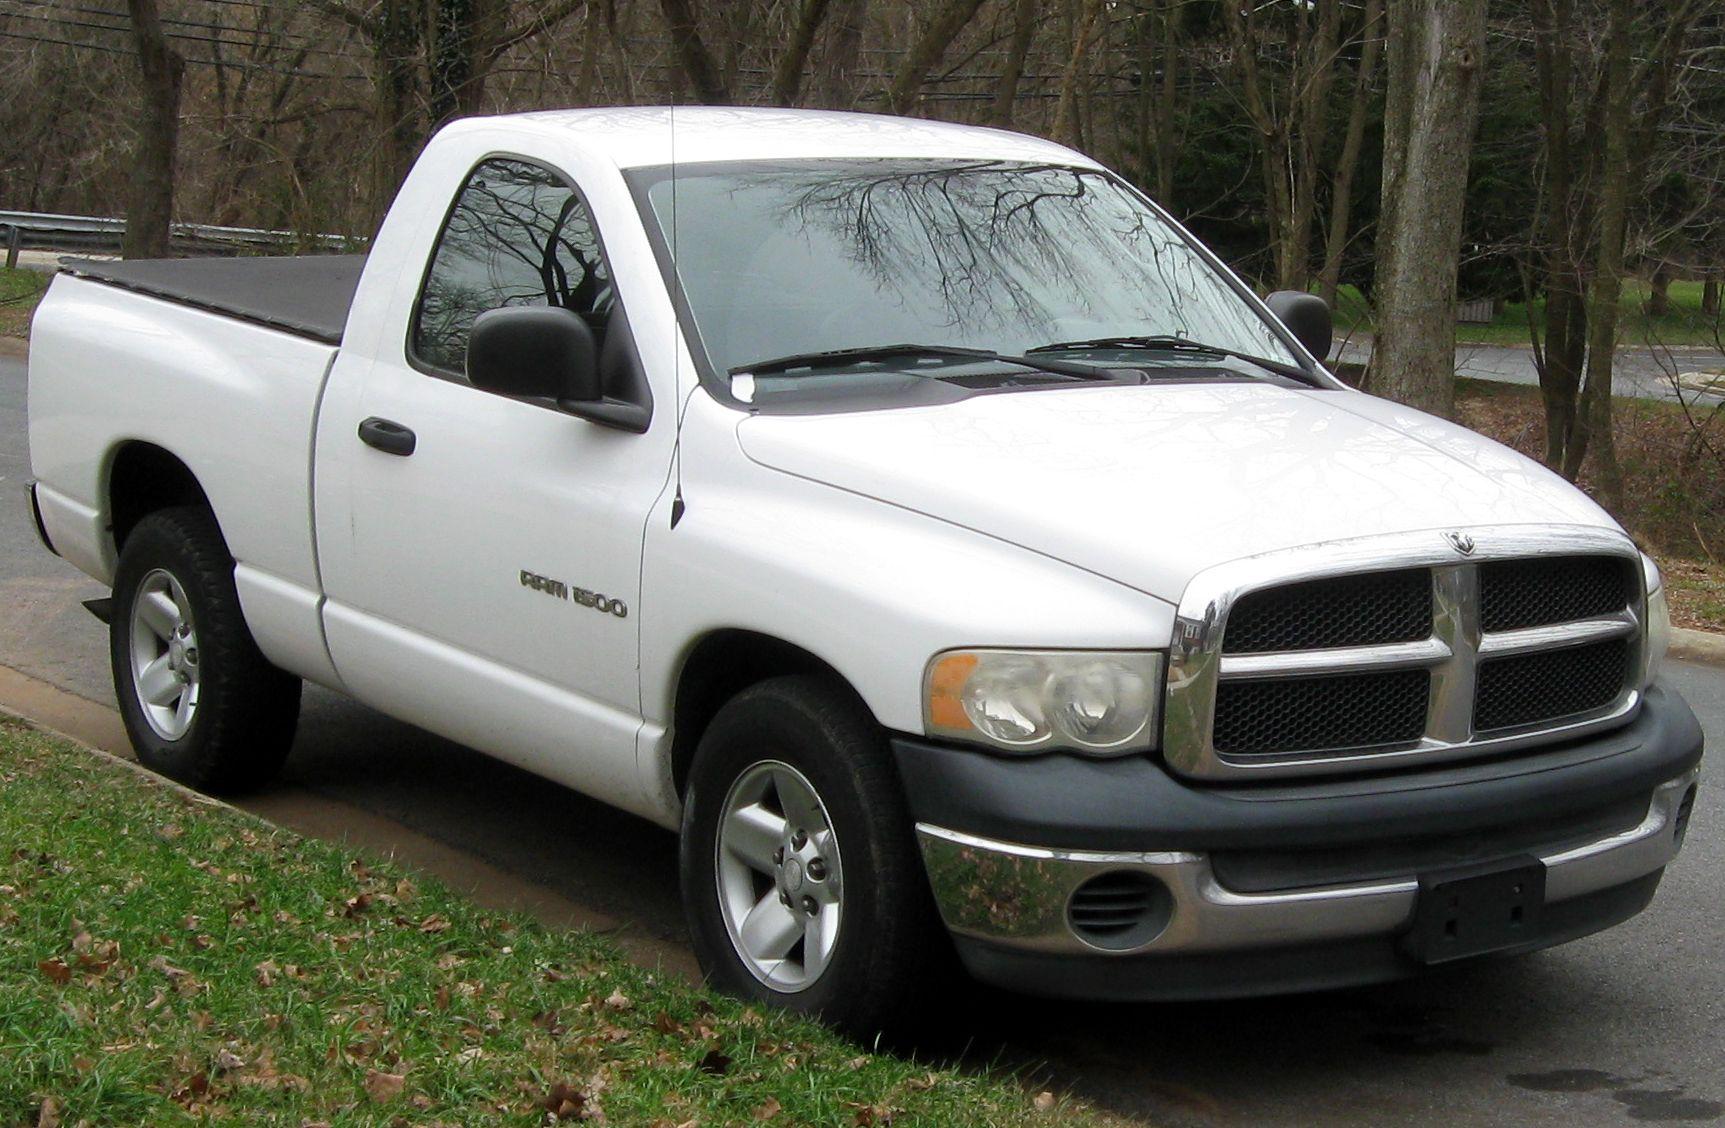 2002 Dodge Ram Pick-up 1500-2500-3500 Service Manual PDF